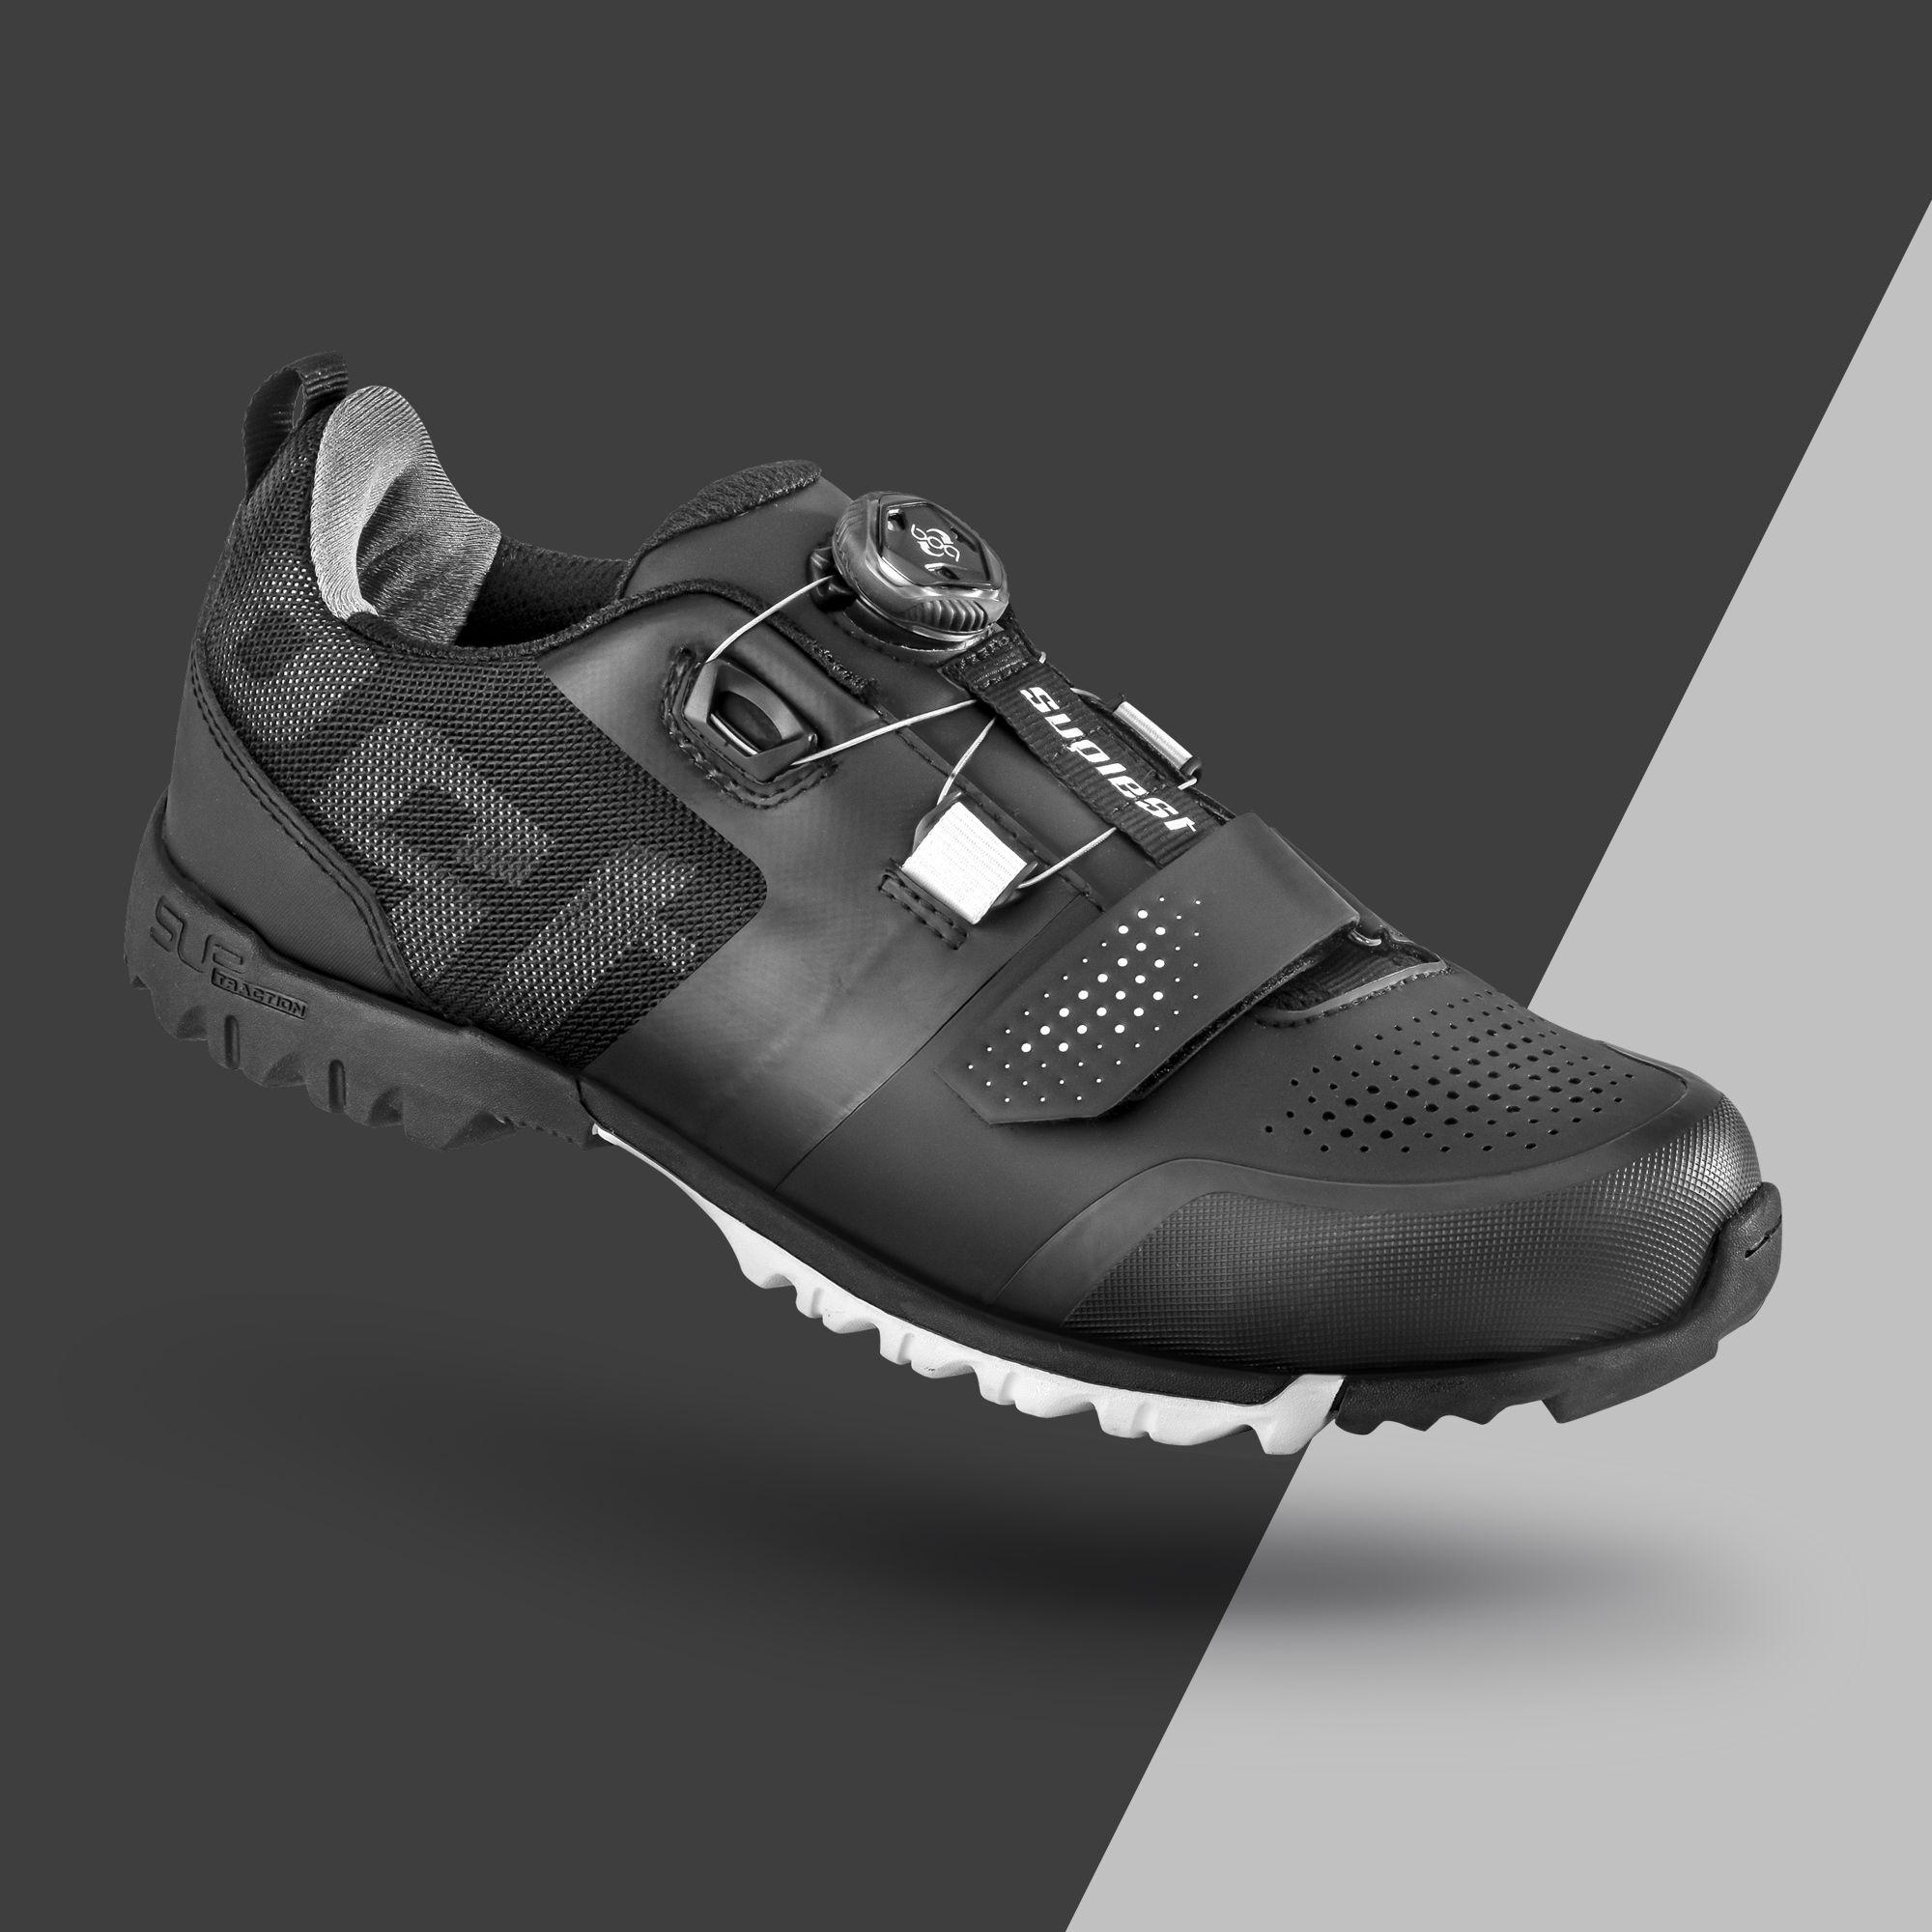 430f6da1a4a suplest. Offroad Pro. Bike Shoes